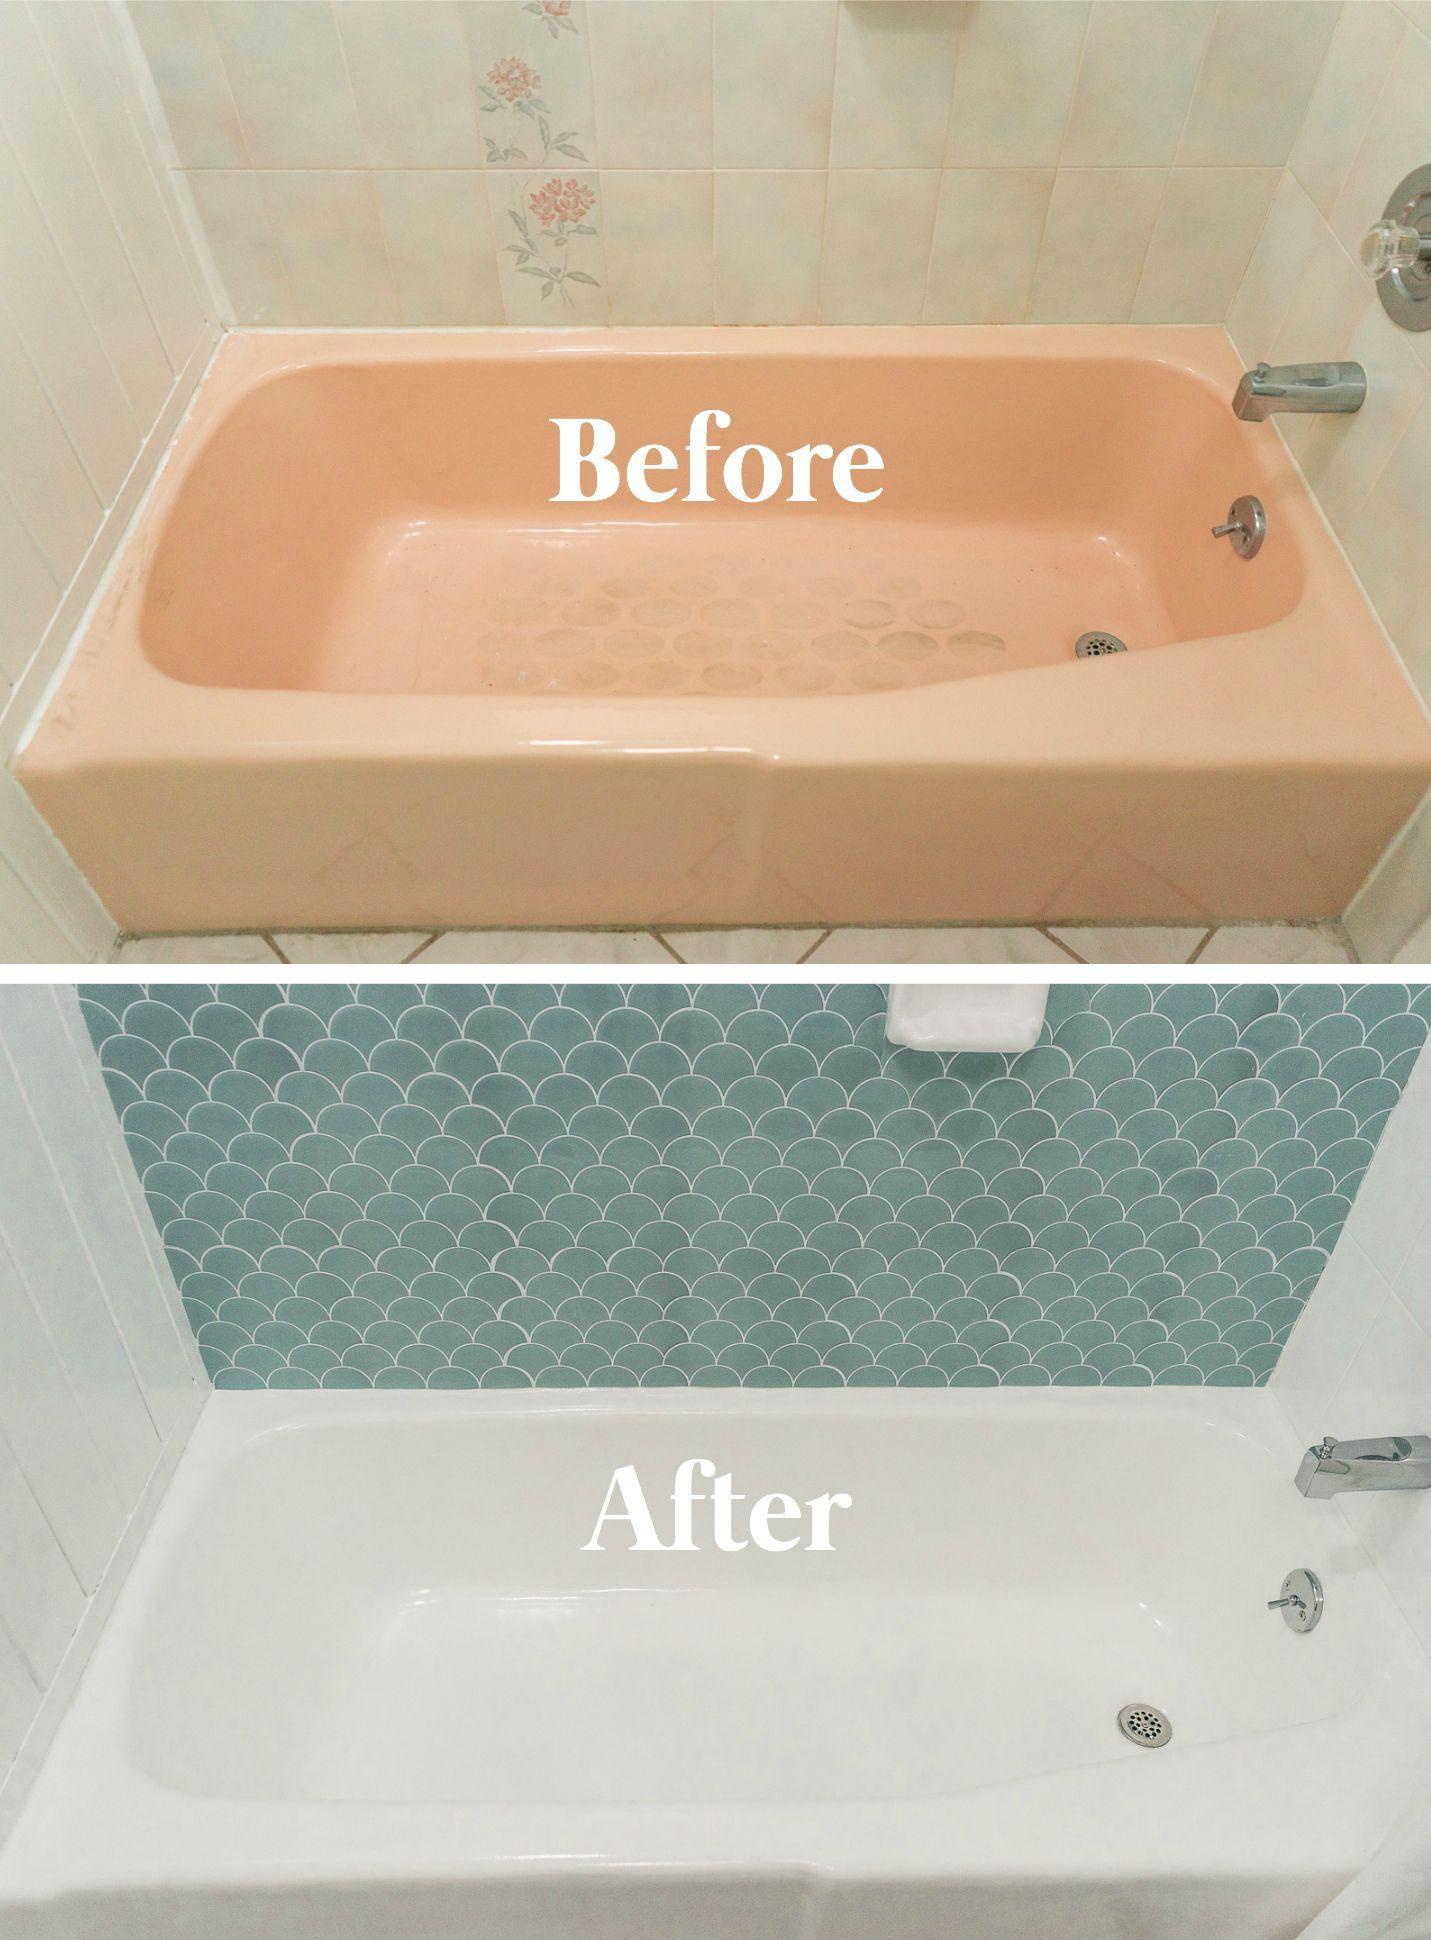 Cross Stitch Paint Bathtub Tile Paint Bathtub Black Painting Bathtub Fiberglass How To Paint Bathtub Spra In 2020 Diy Bathroom Makeover Painting Bathtub Bathtub Tile